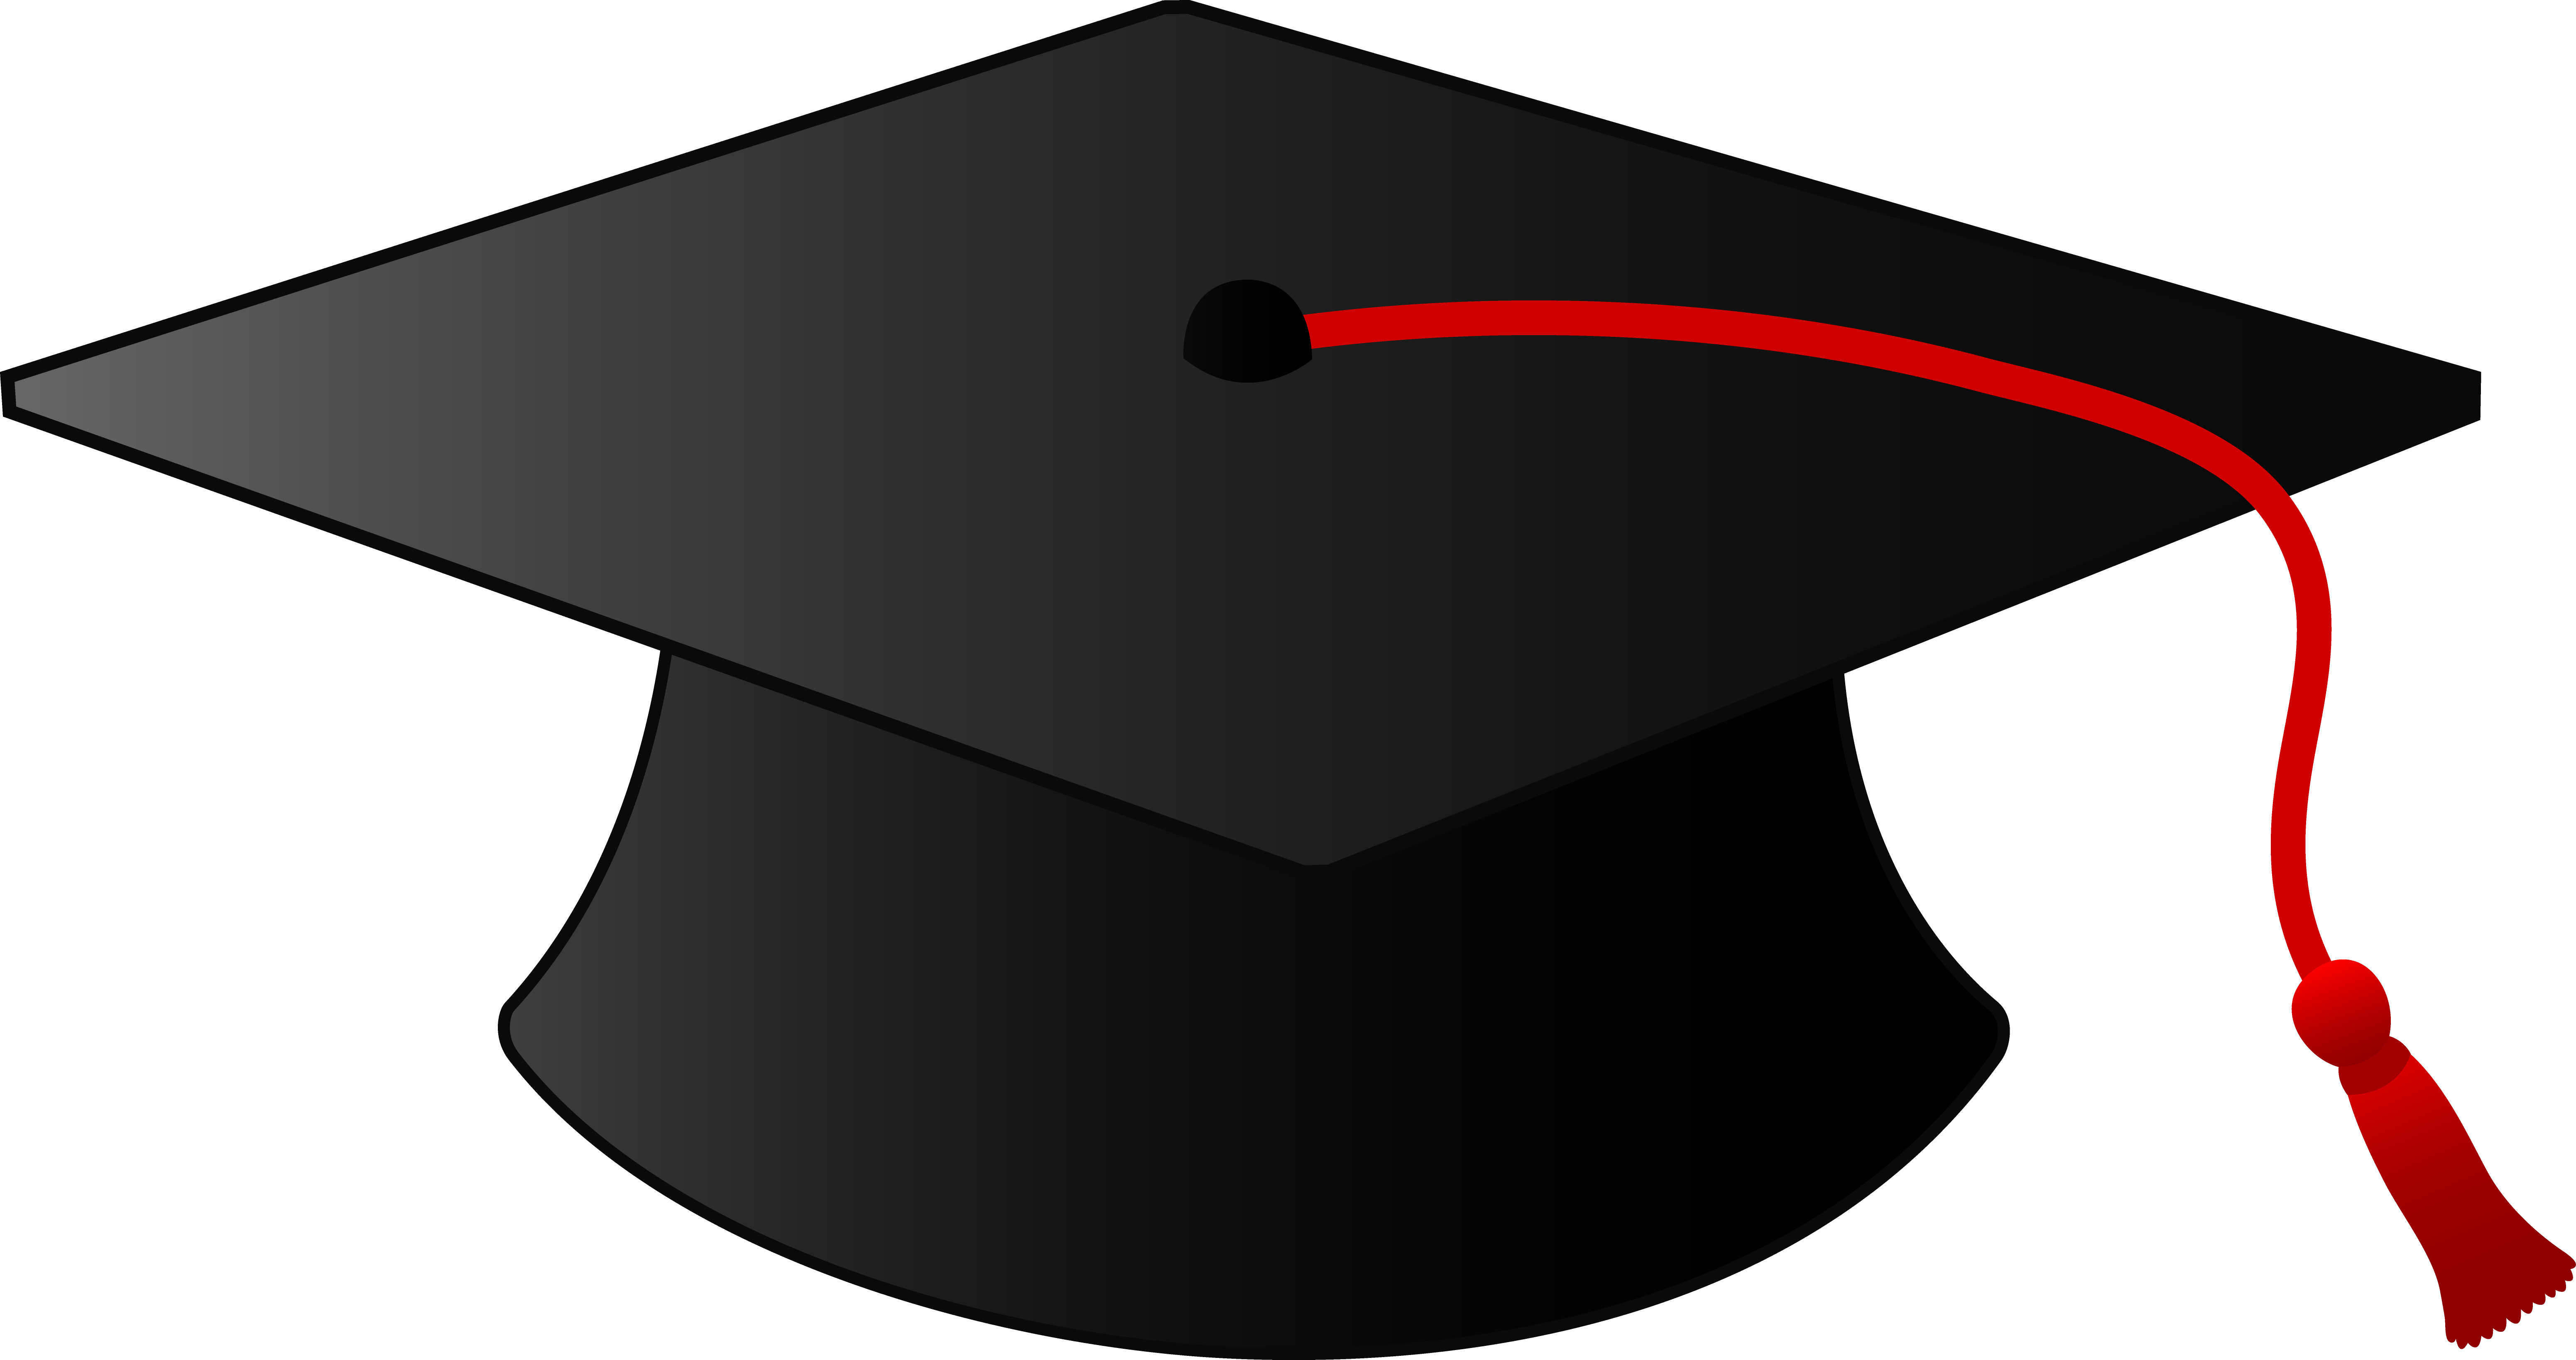 6204x3275 Graduation Cap With Tassel